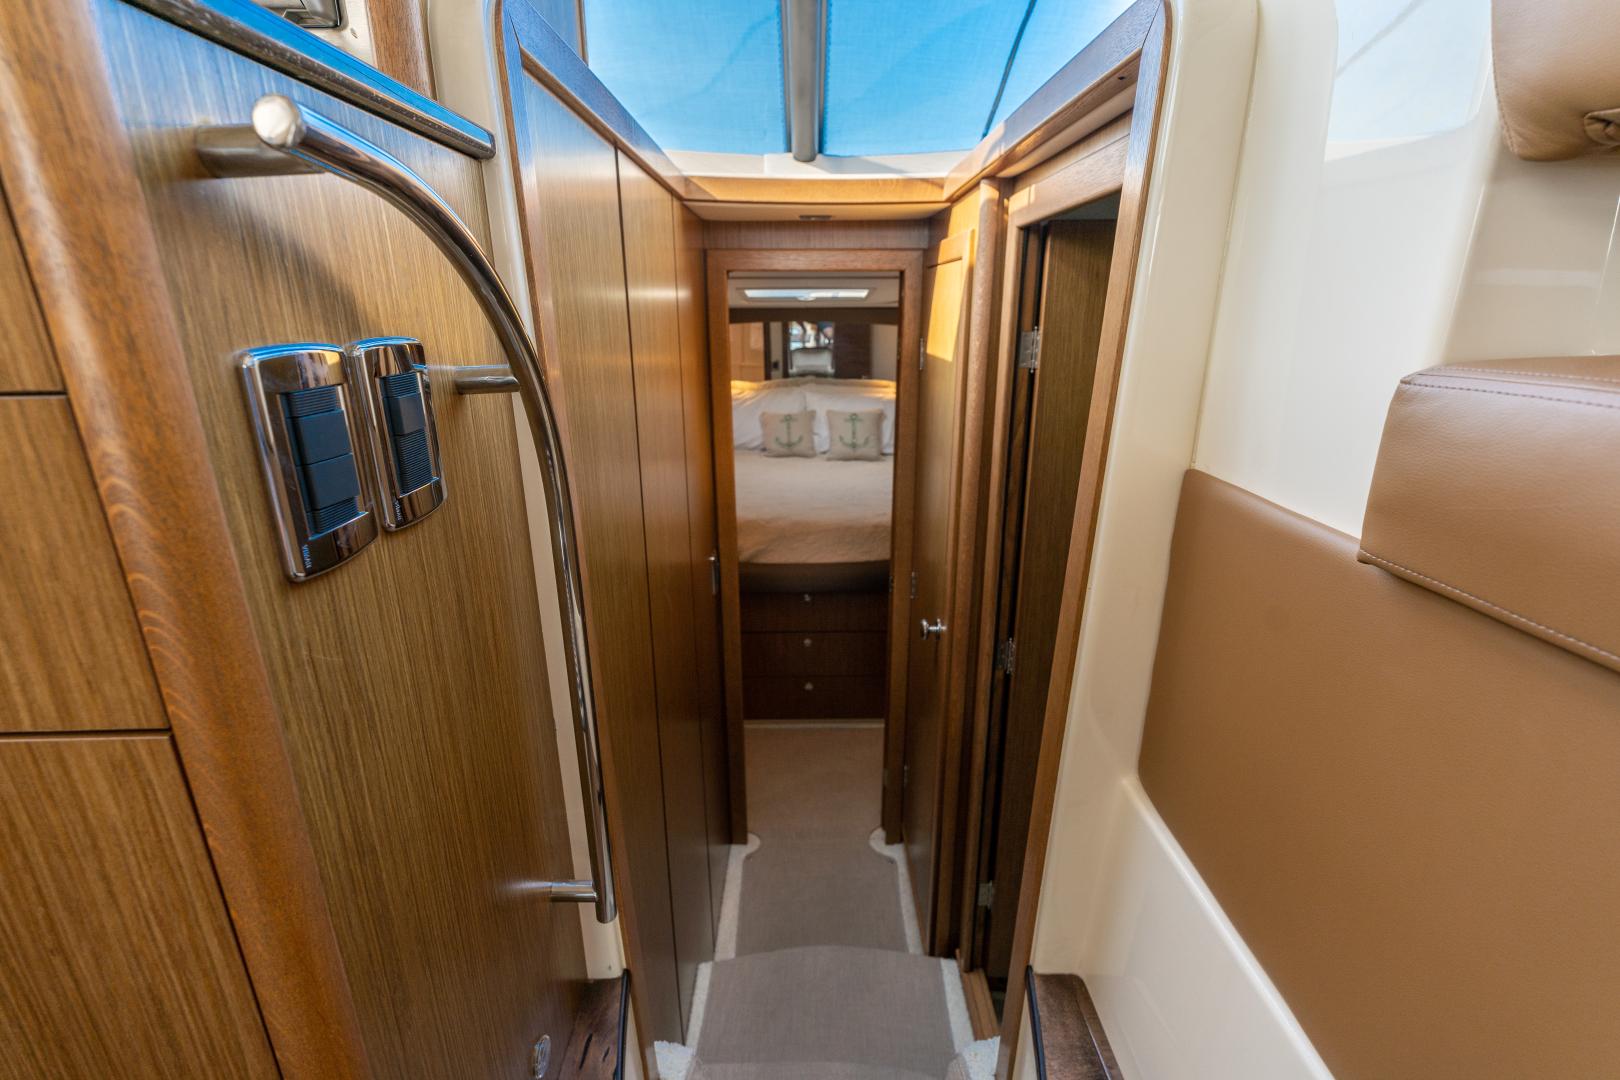 Meridian-441 Motor Yacht 2016-Friend Ship League City-Texas-United States-Meridian 441 2016 Friend Ship-1508199 | Thumbnail